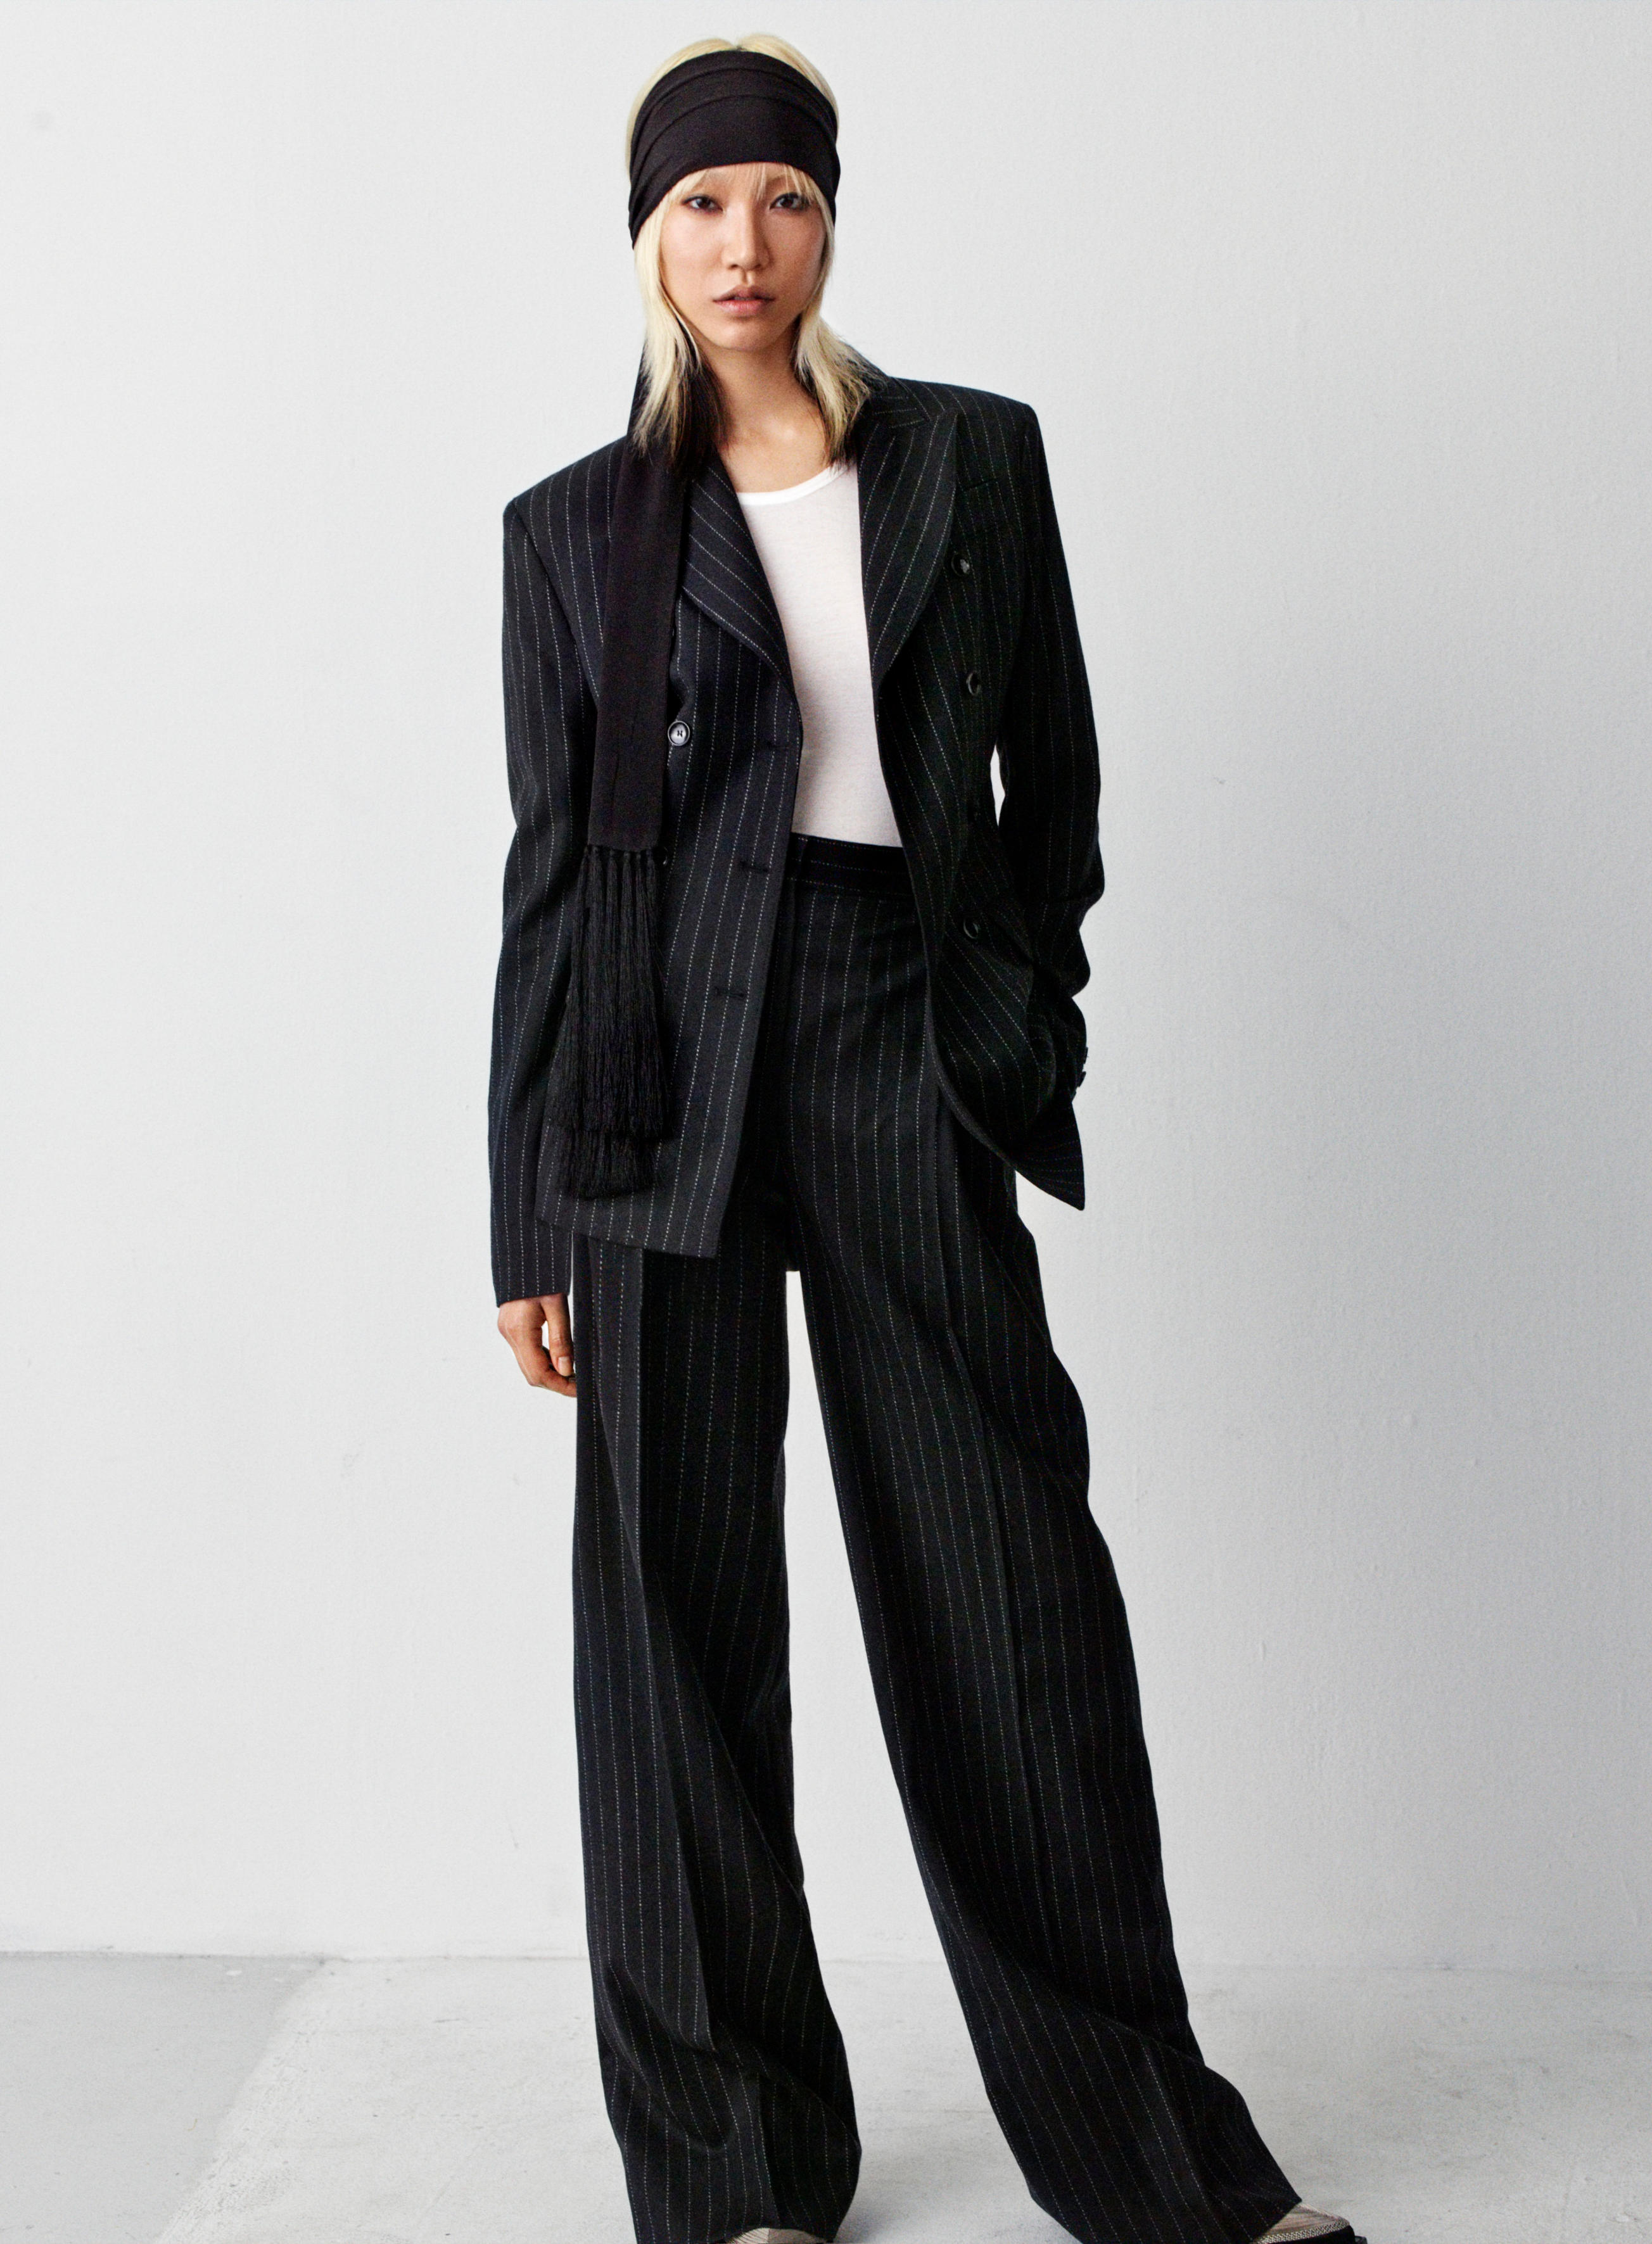 H&M Studio Fall Winter 2016 Women's Lookbook (11)